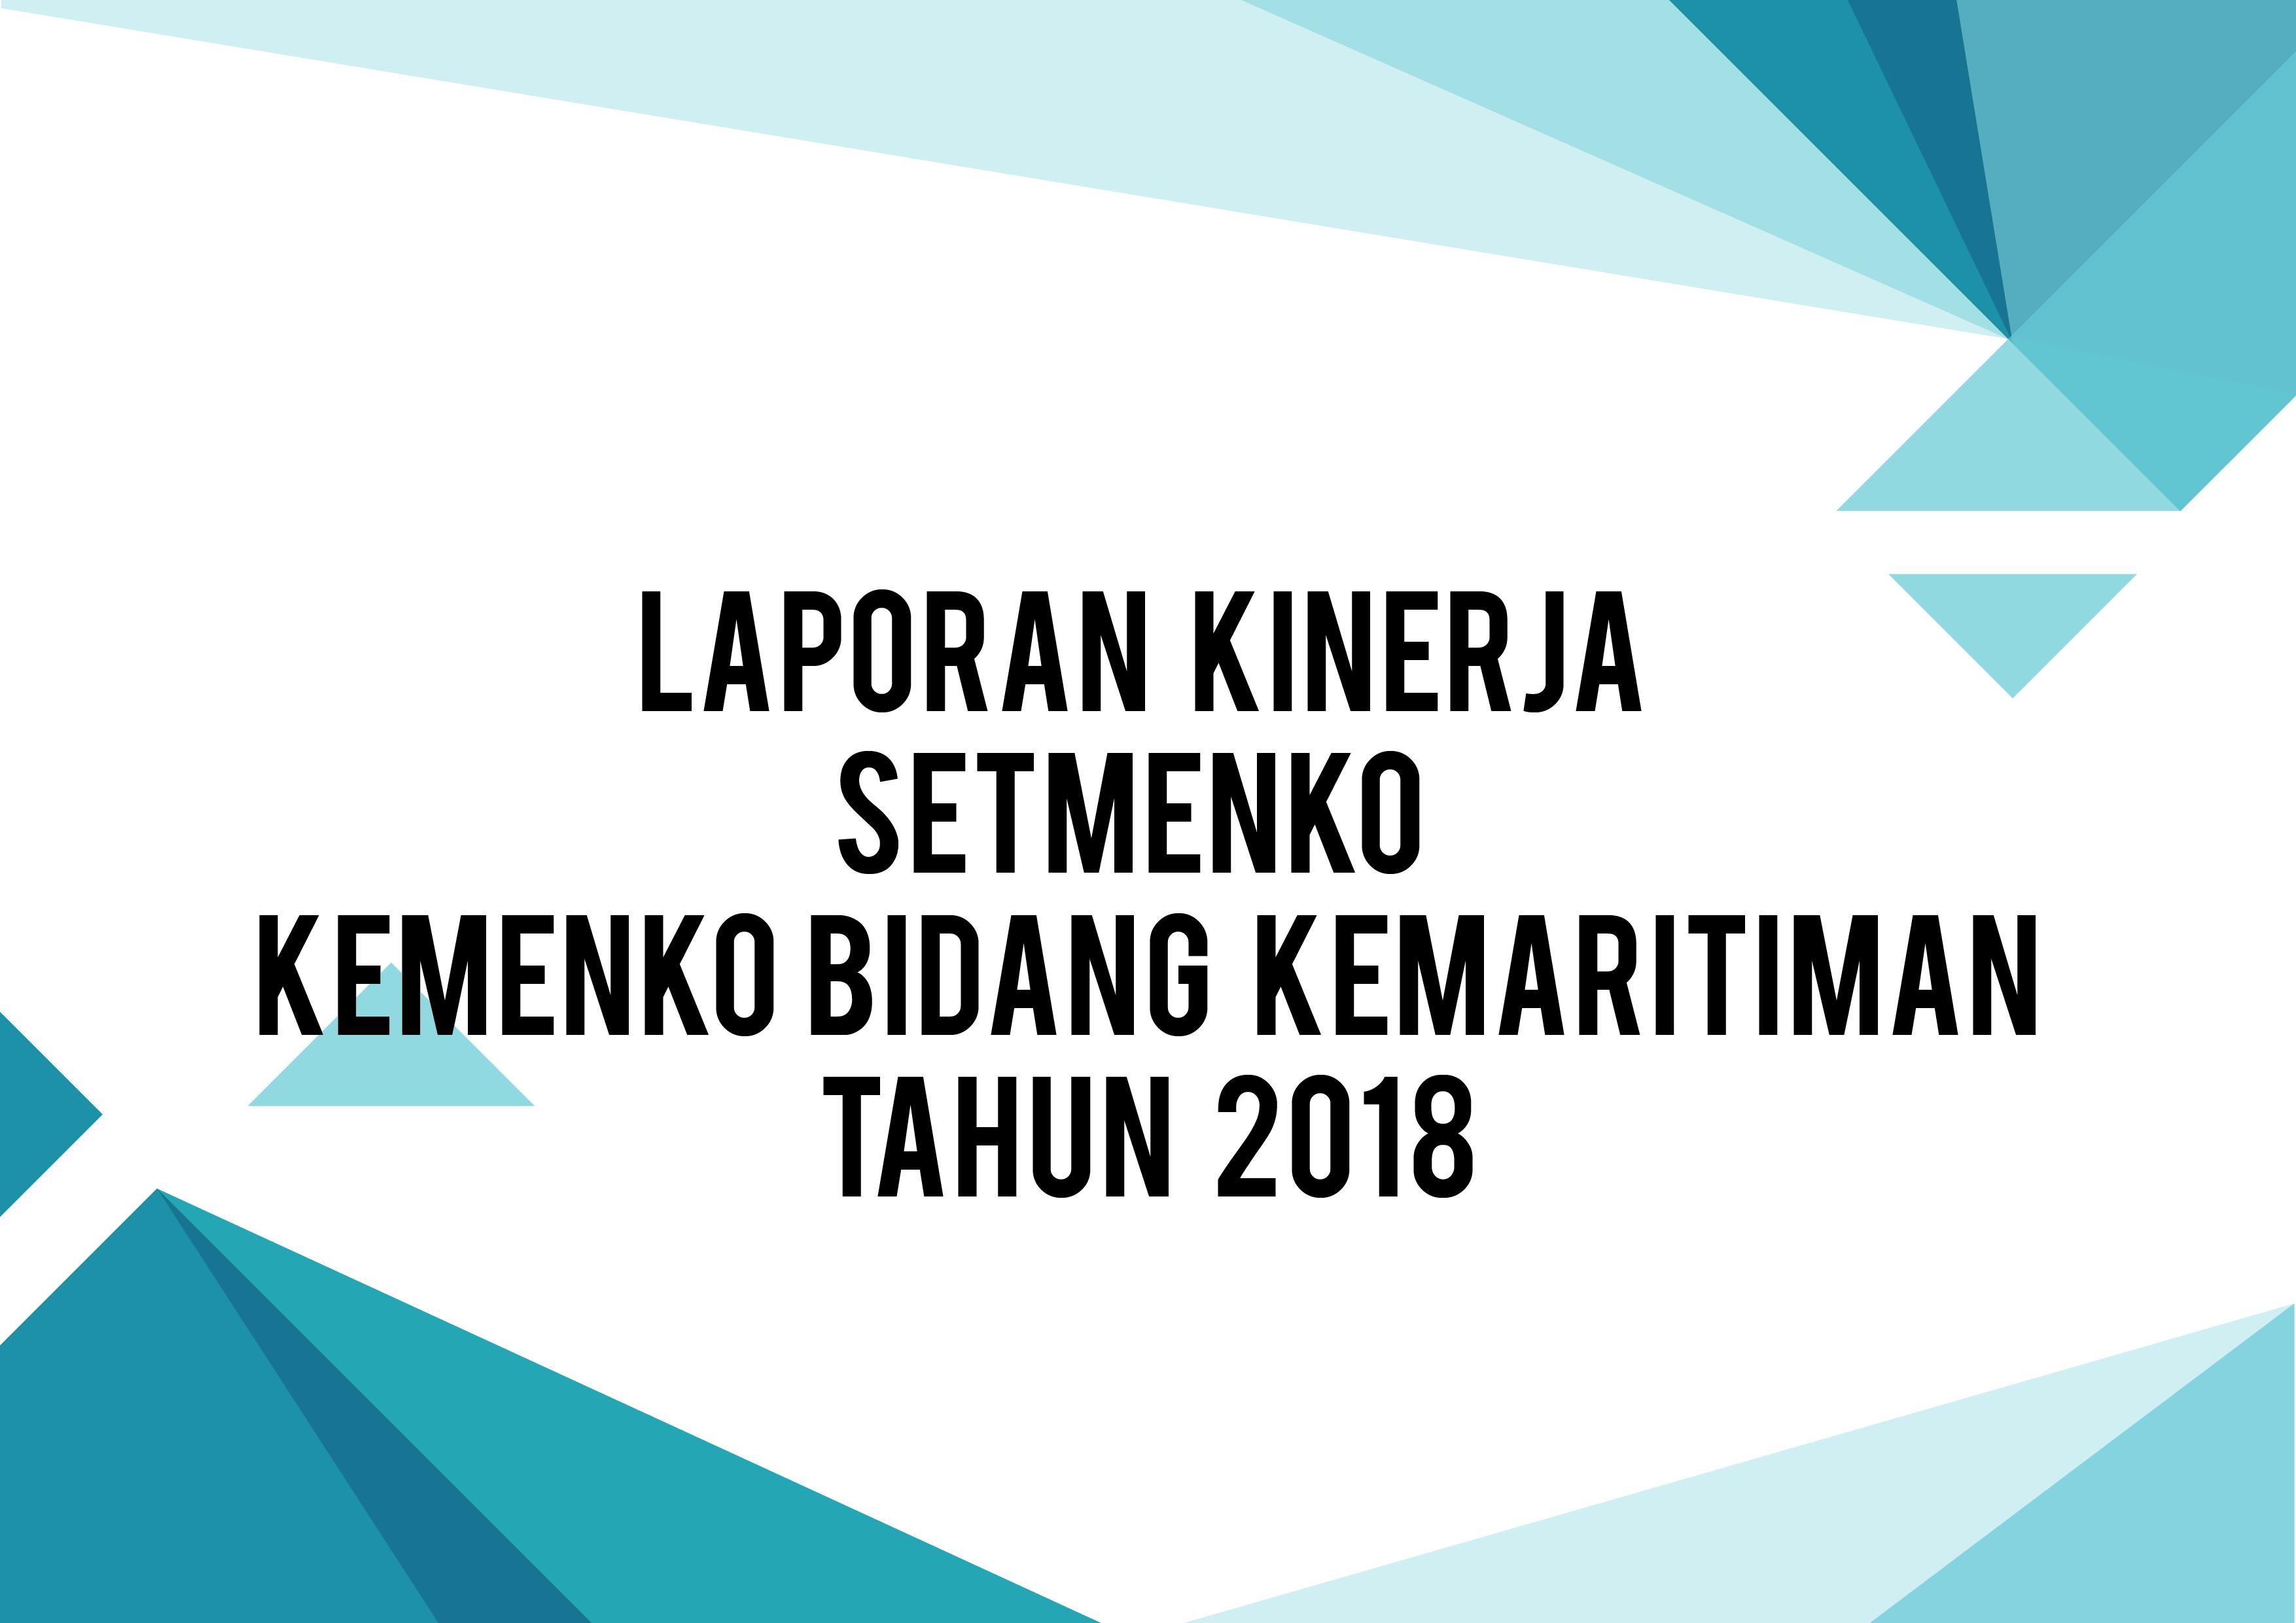 Laporan Setmenko Kemenko Bidang Kemaritiman 2018